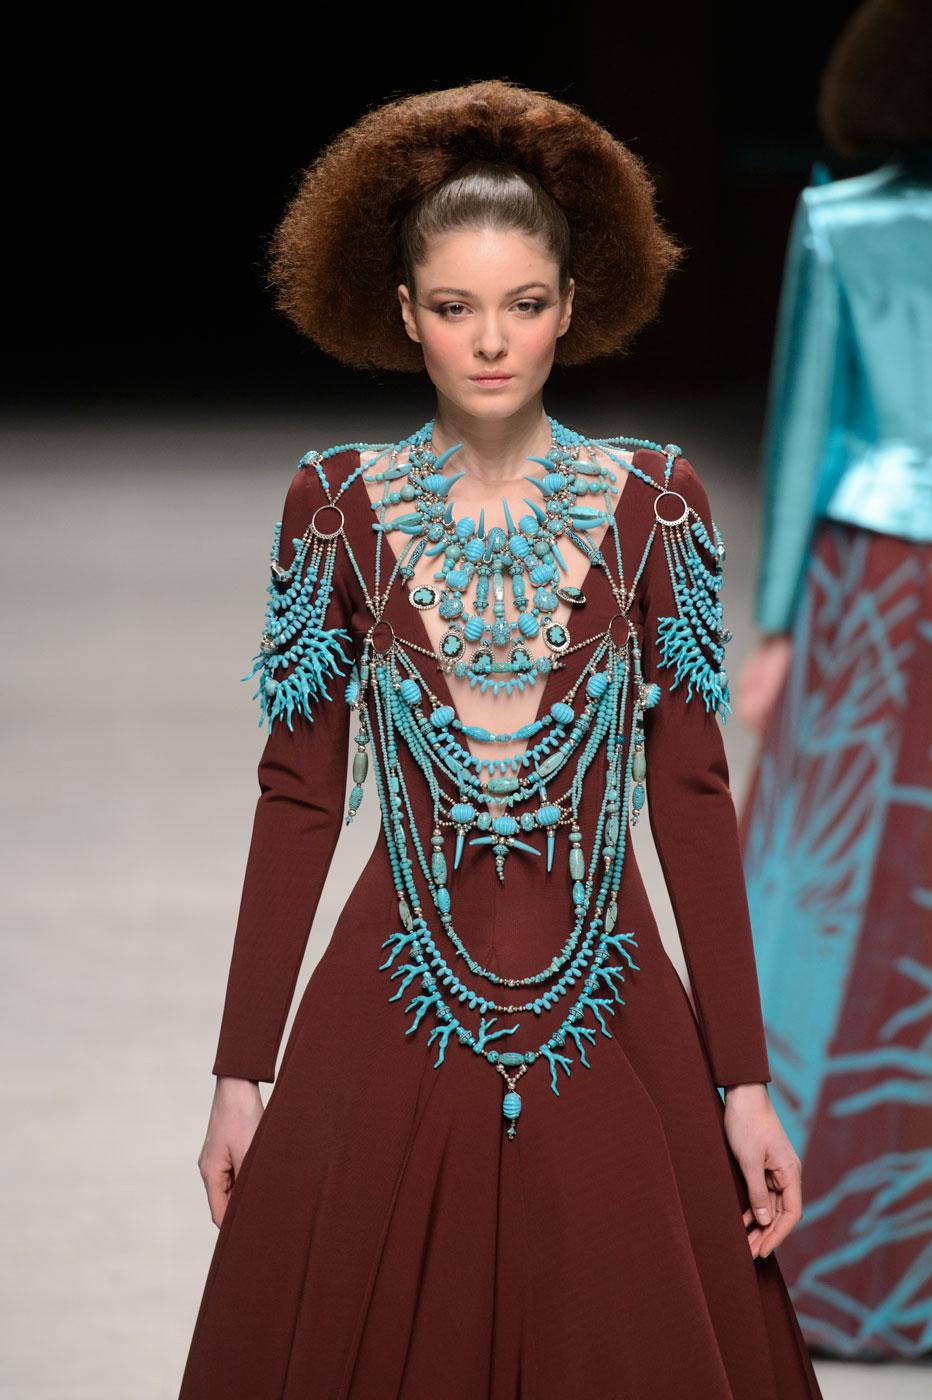 Julien-Fournie-Prive-fashion-runway-show-haute-couture-paris-spring-2015-the-impression-49